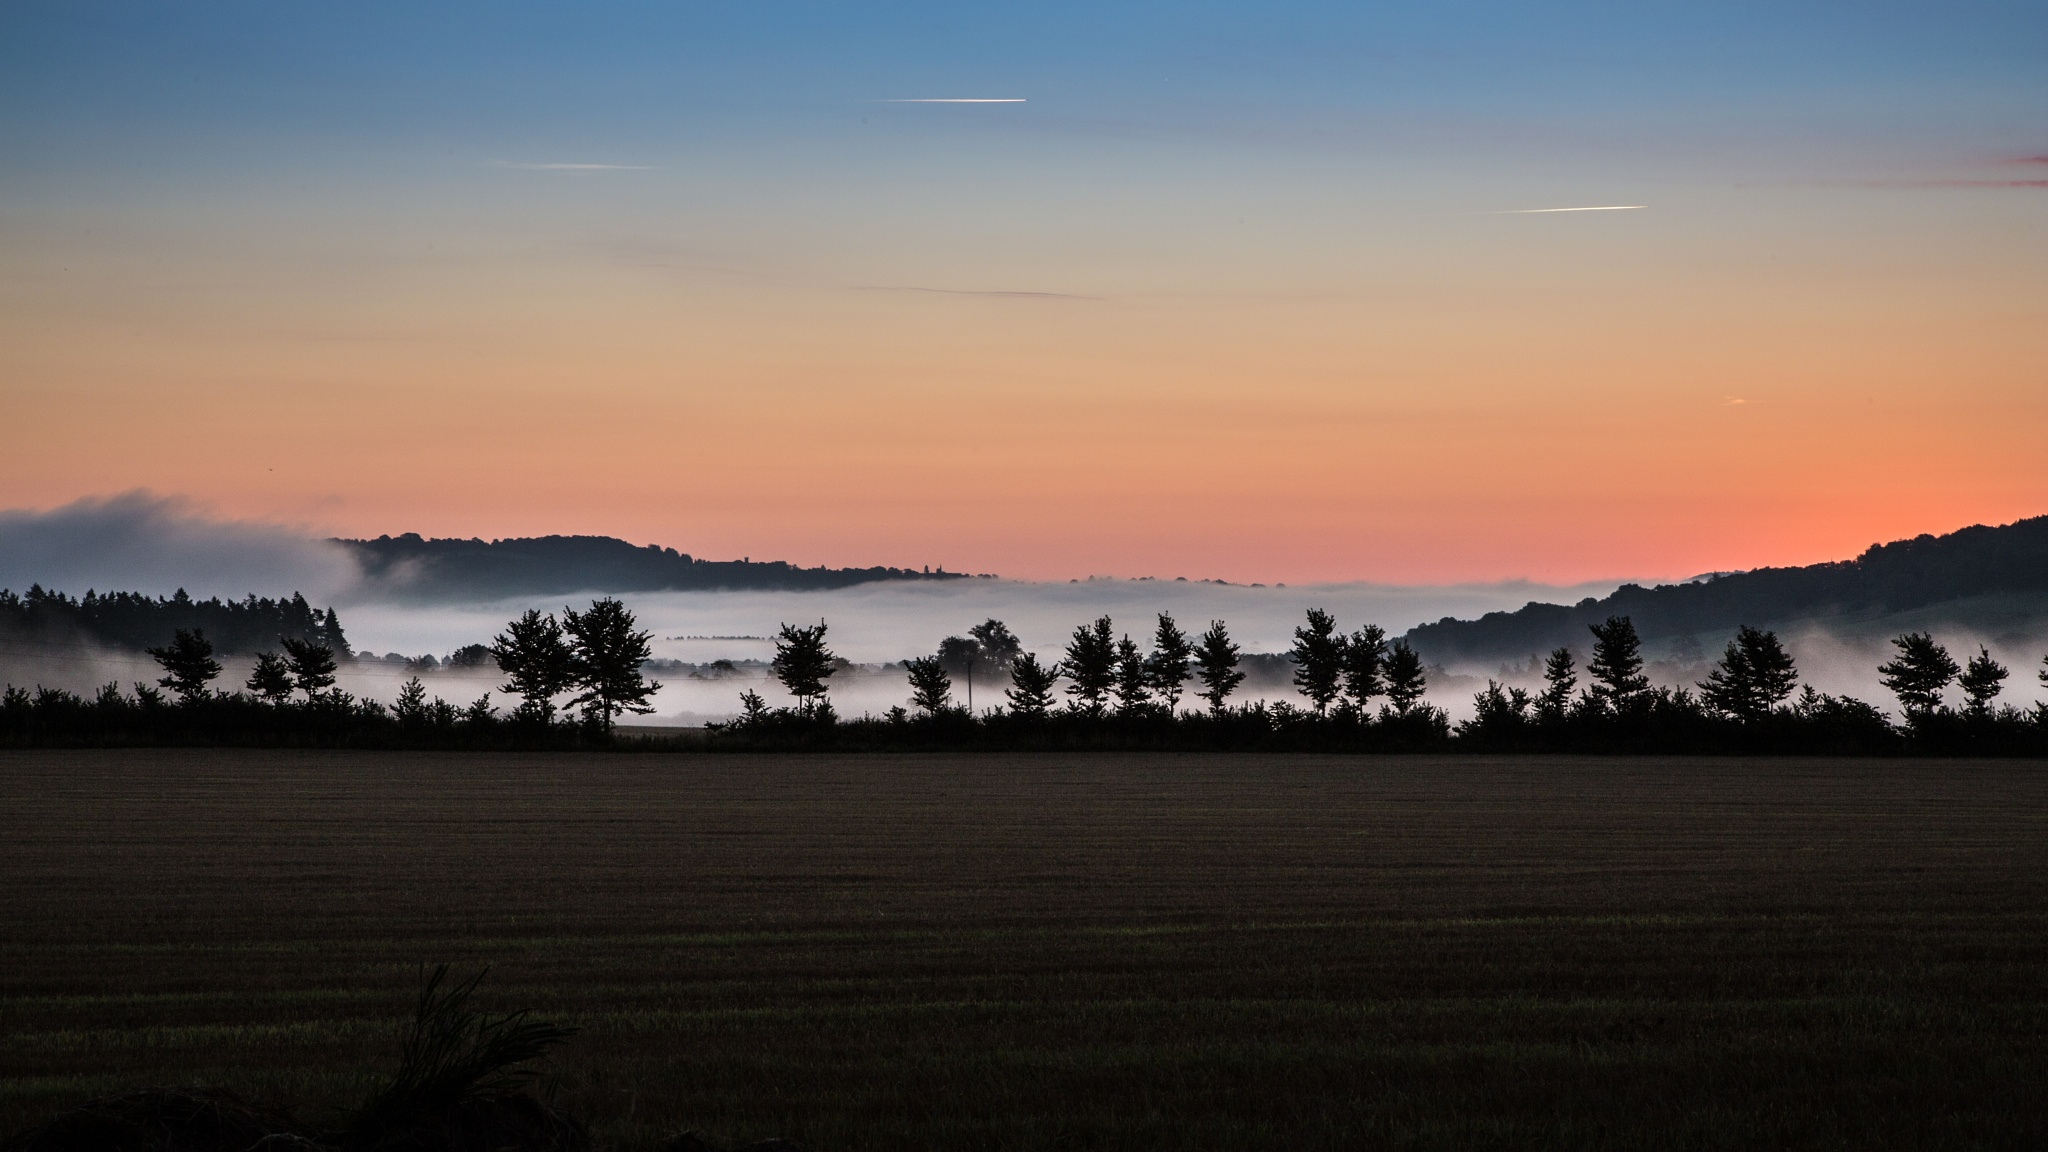 Misty morning colours by Steve H